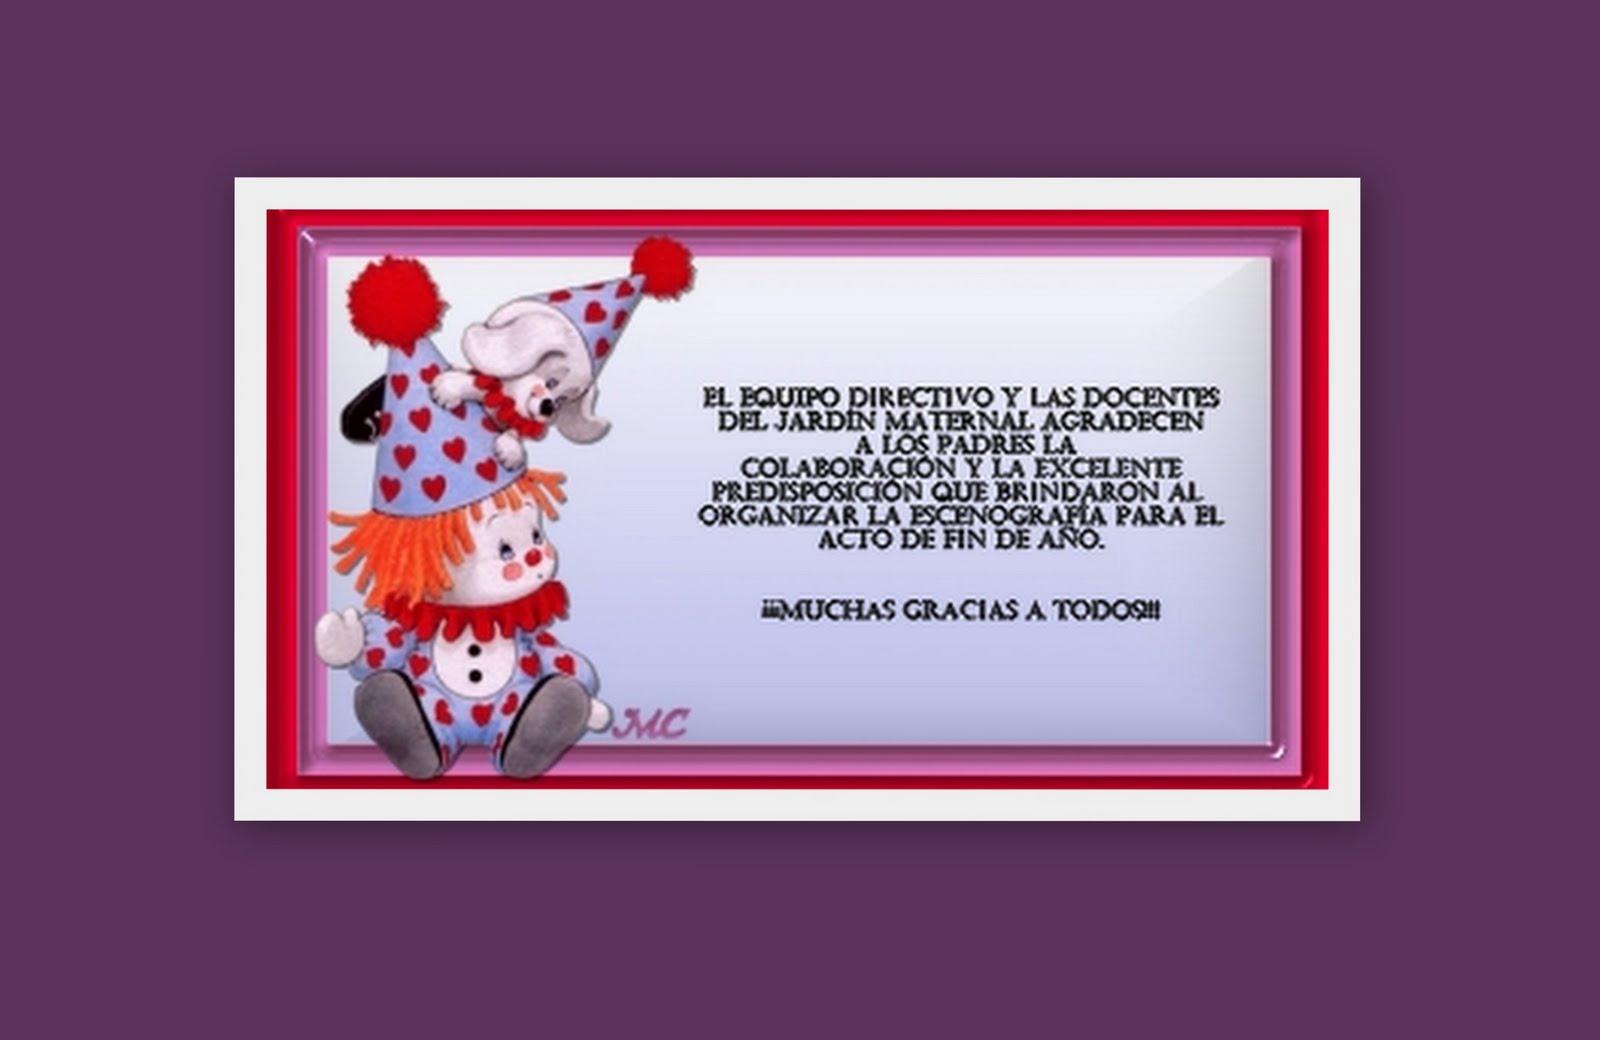 Ser feliz desde la ni ez jard n maternal agradecimientos for Jardin maternal unlp 2015